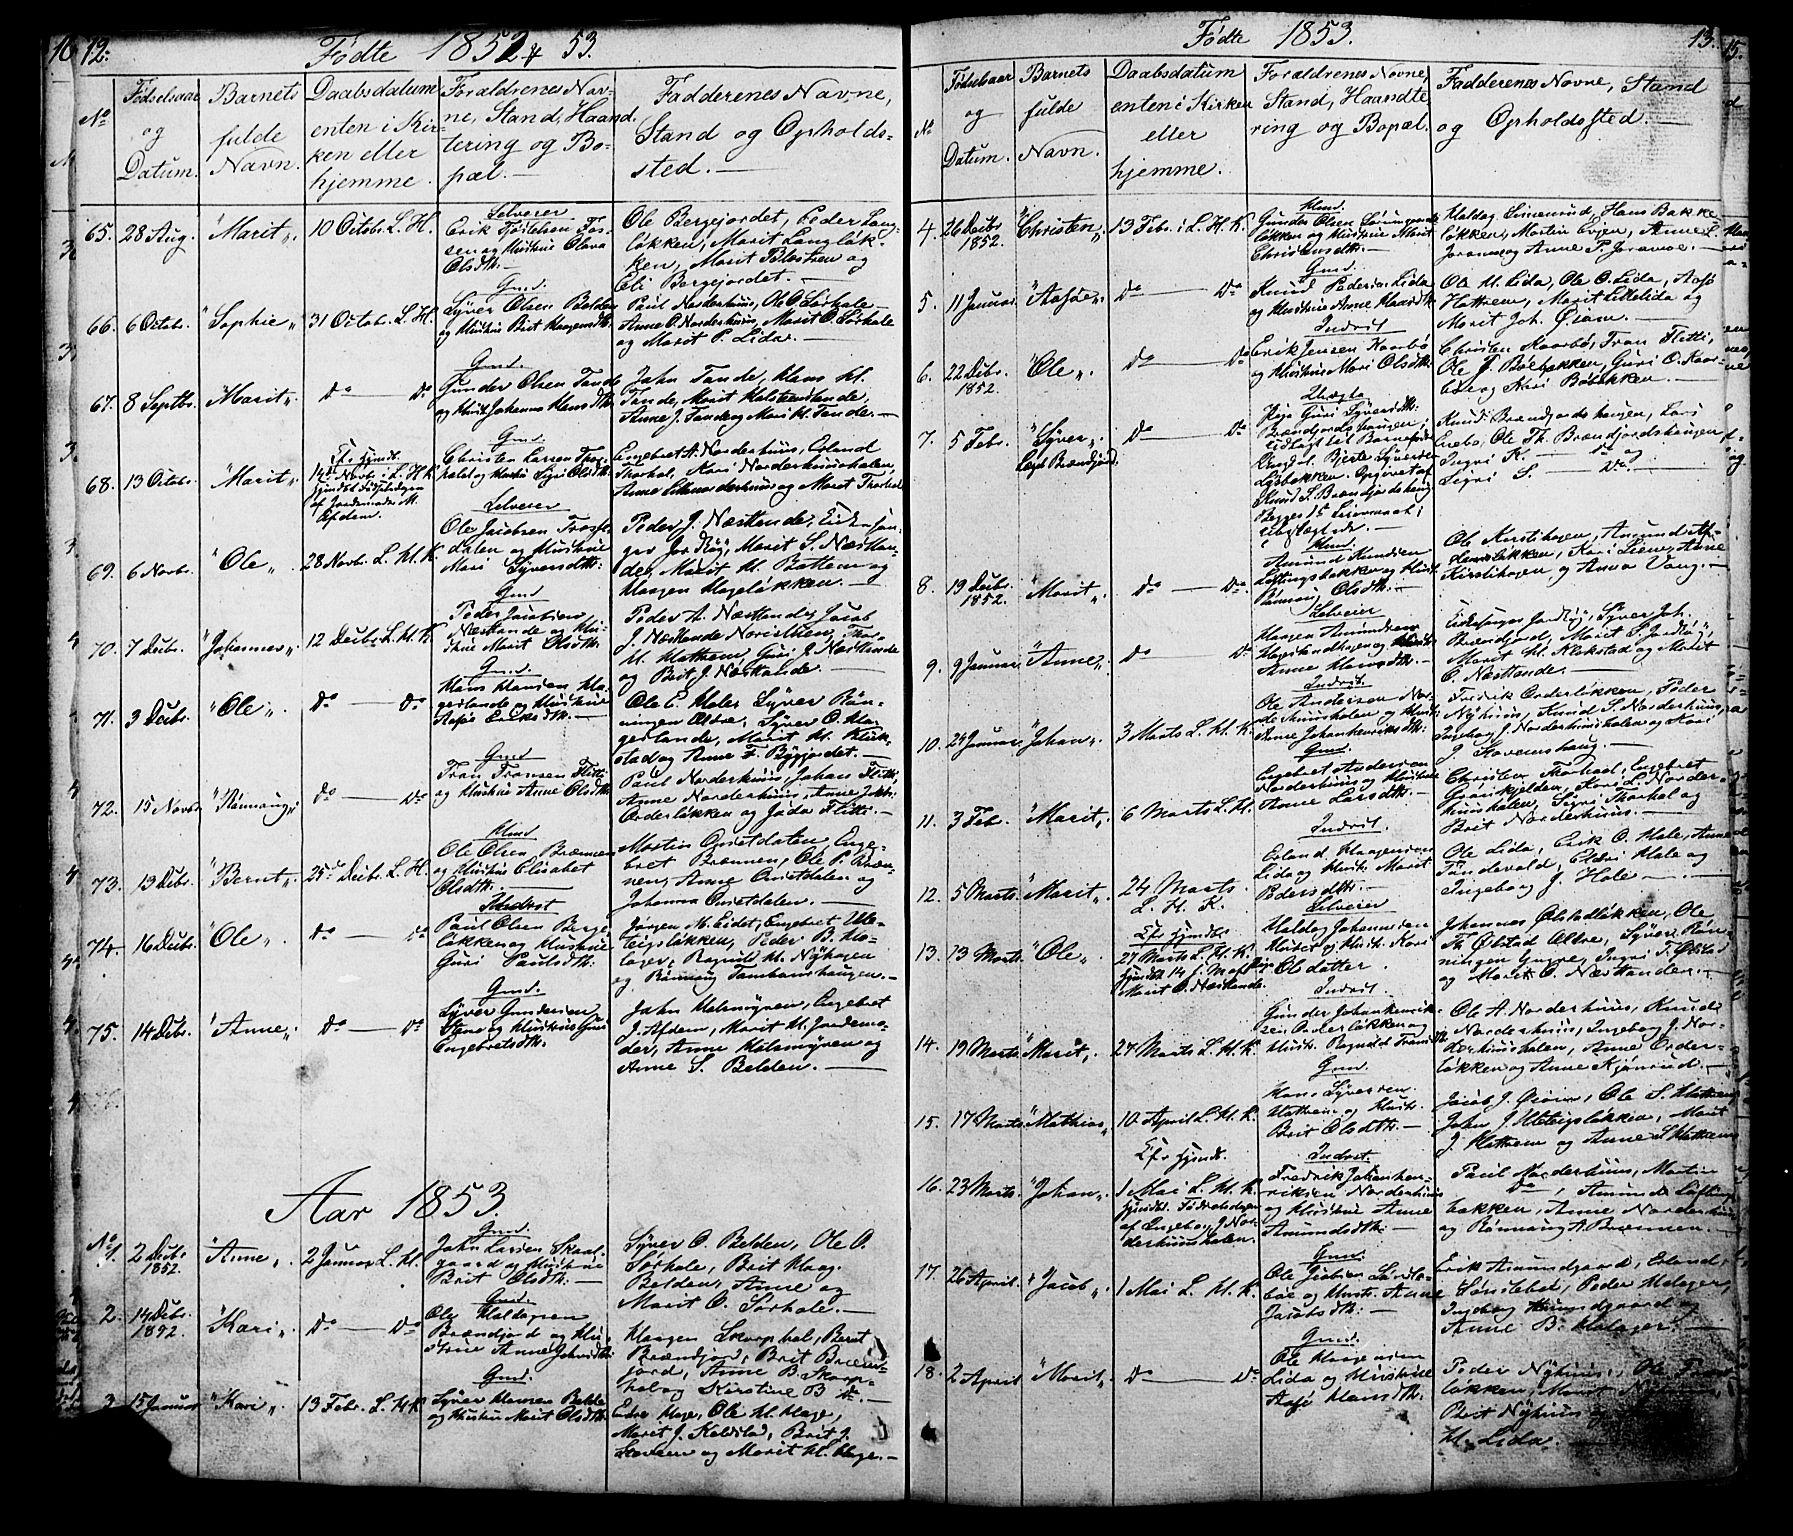 SAH, Lesja prestekontor, Klokkerbok nr. 5, 1850-1894, s. 12-13